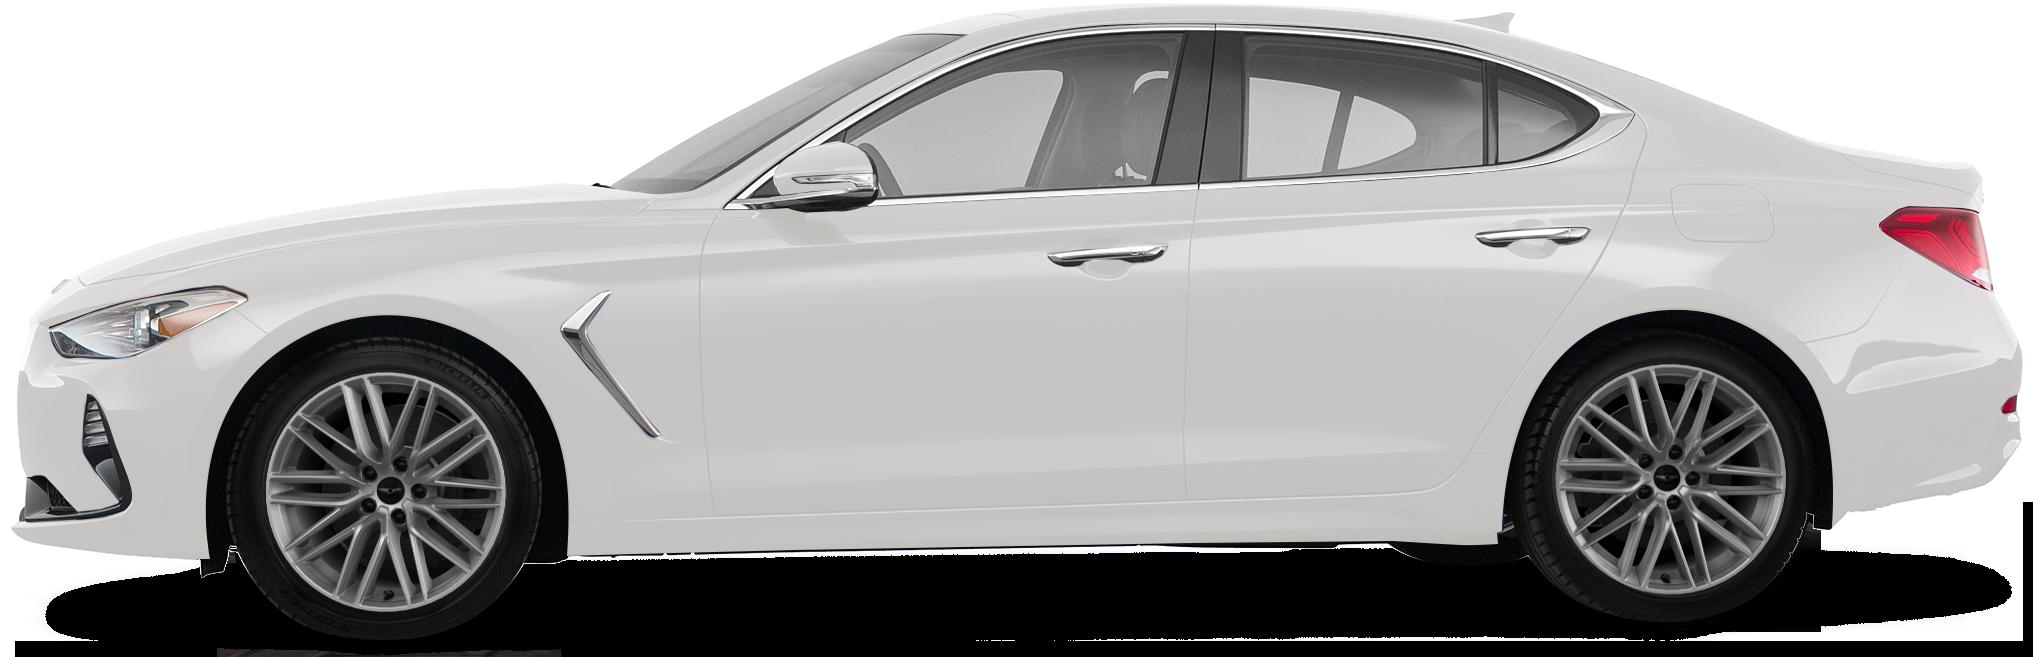 2020 Genesis G70 Sedan 2.0T Standard AWD